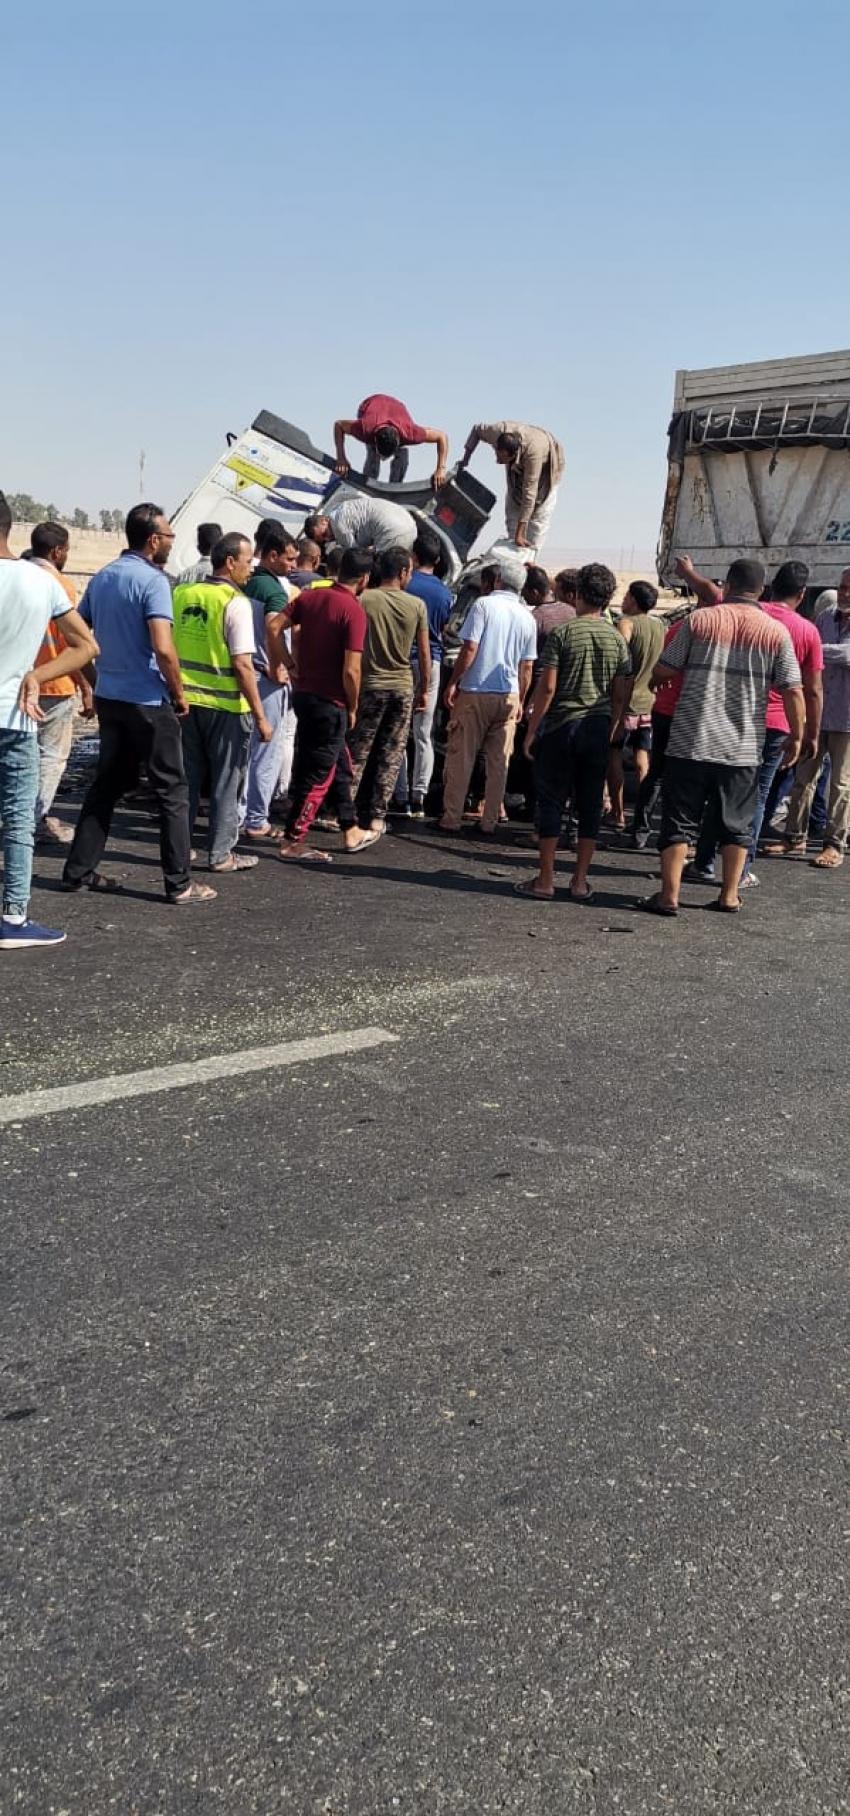 حادث انقلاب سياره نقل بطريق السخنه بالسويس